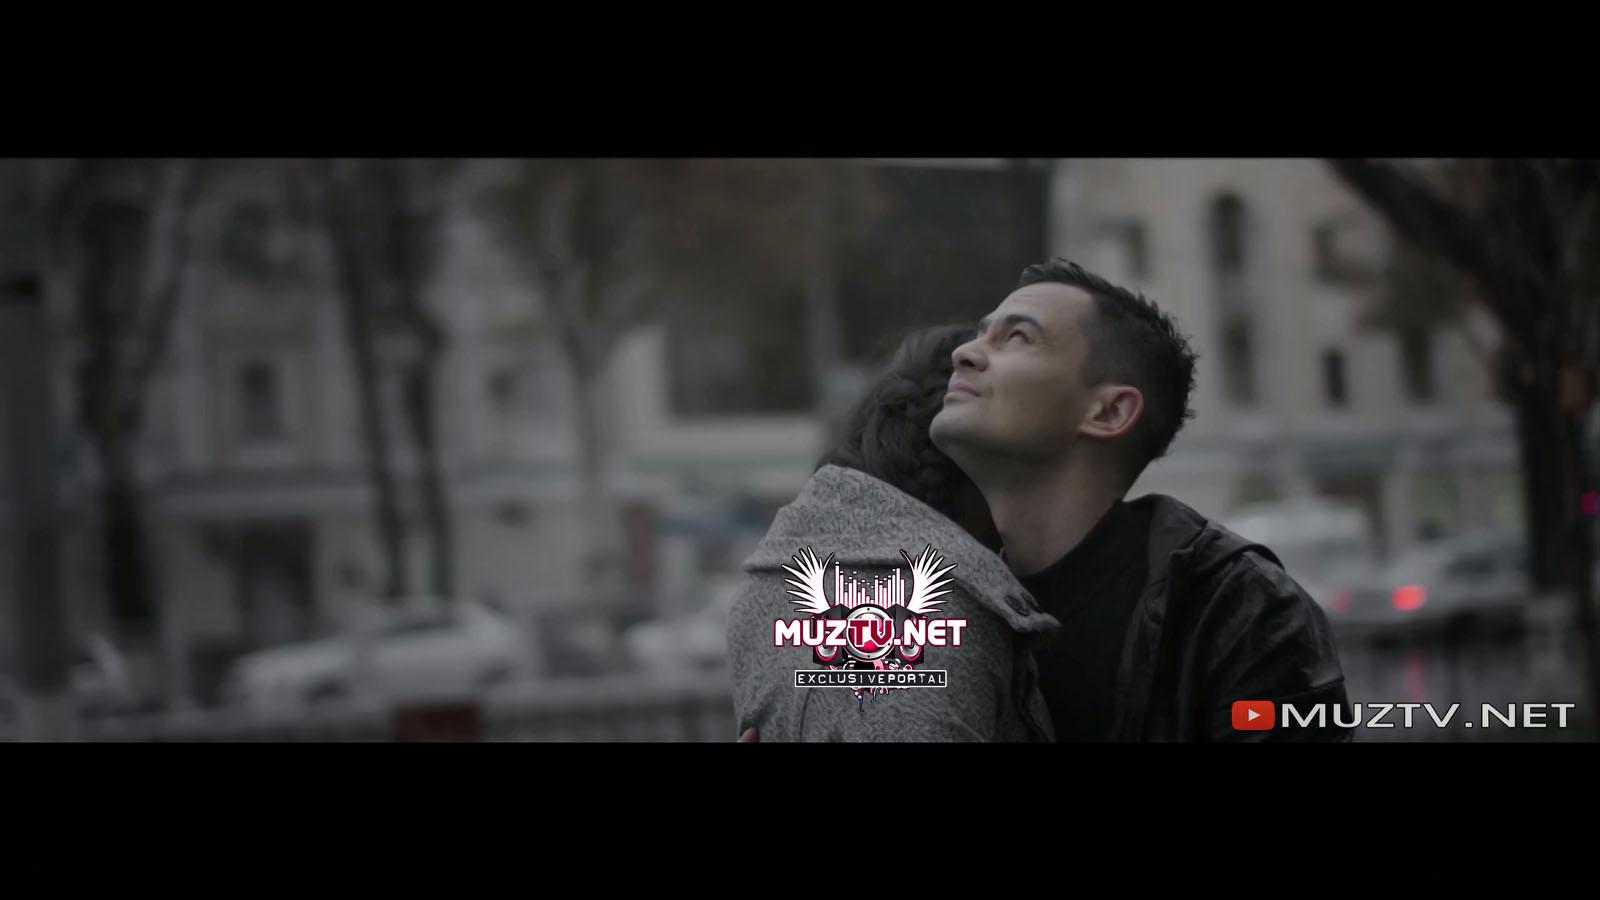 JASUR UMIROV GULI MP3 СКАЧАТЬ БЕСПЛАТНО